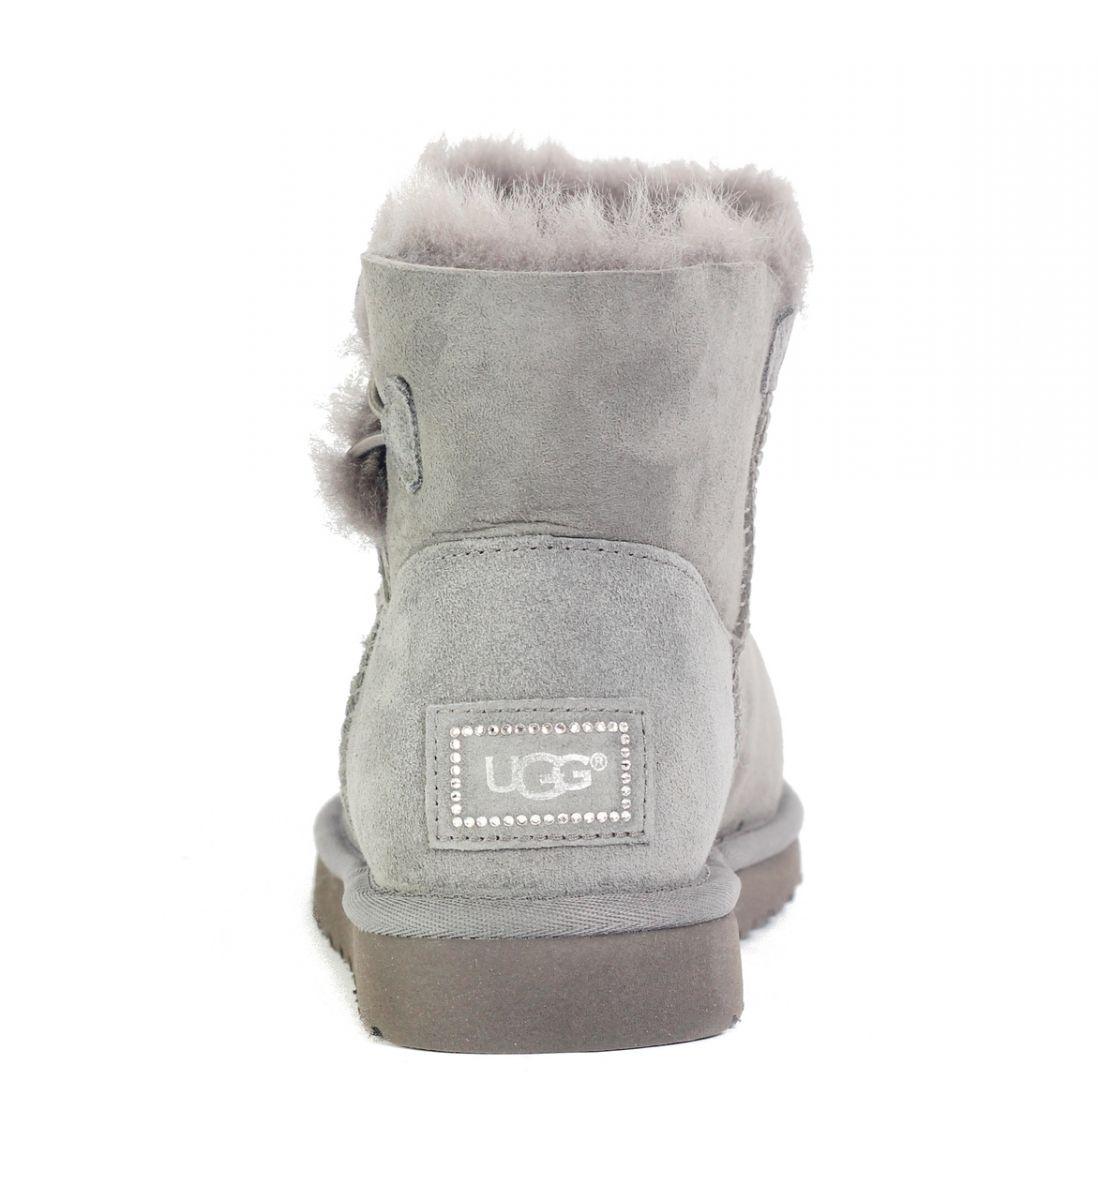 7e3fc53b426 UGG Australia for Women: Mini Bailey Button Bling Grey Boots Grey